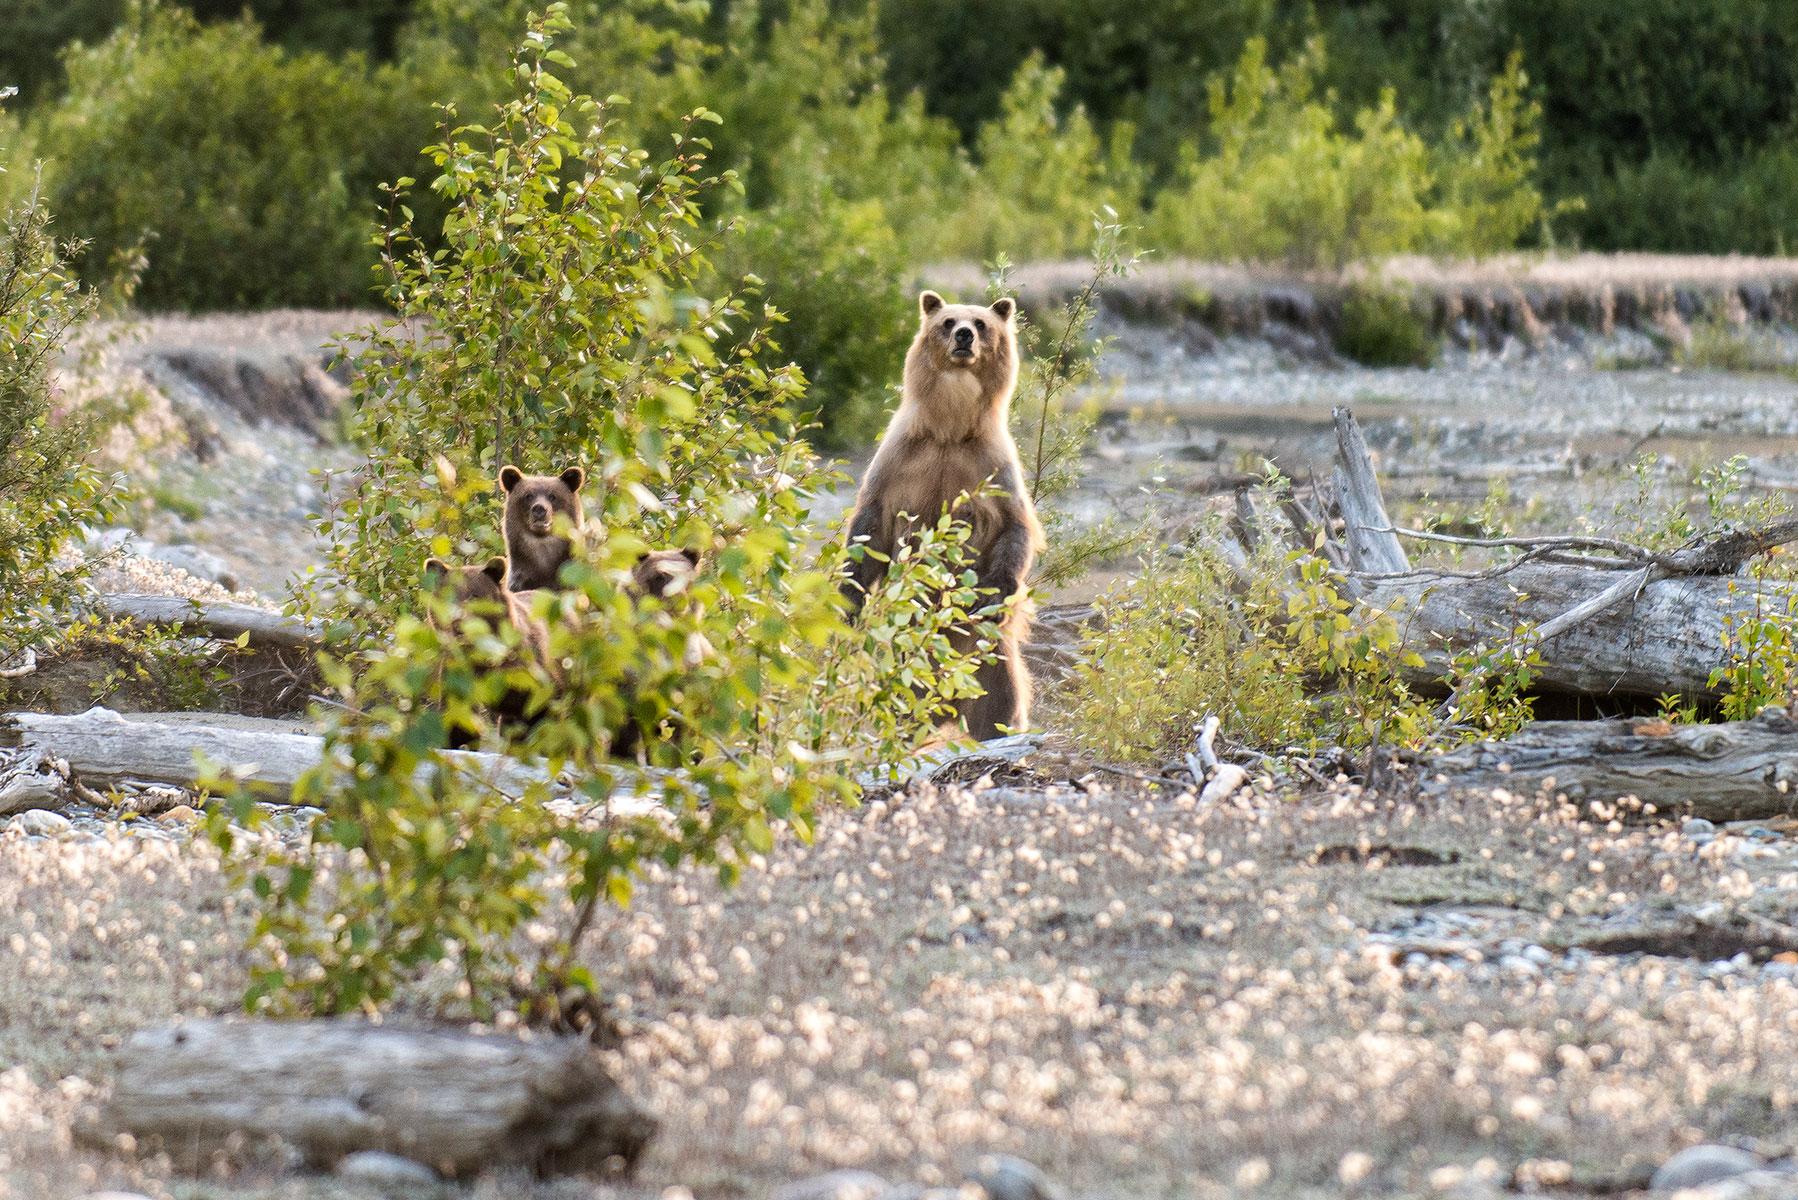 austin-trigg-brave-wilderness-alaska-Brown-Bear-Encounter.jpg